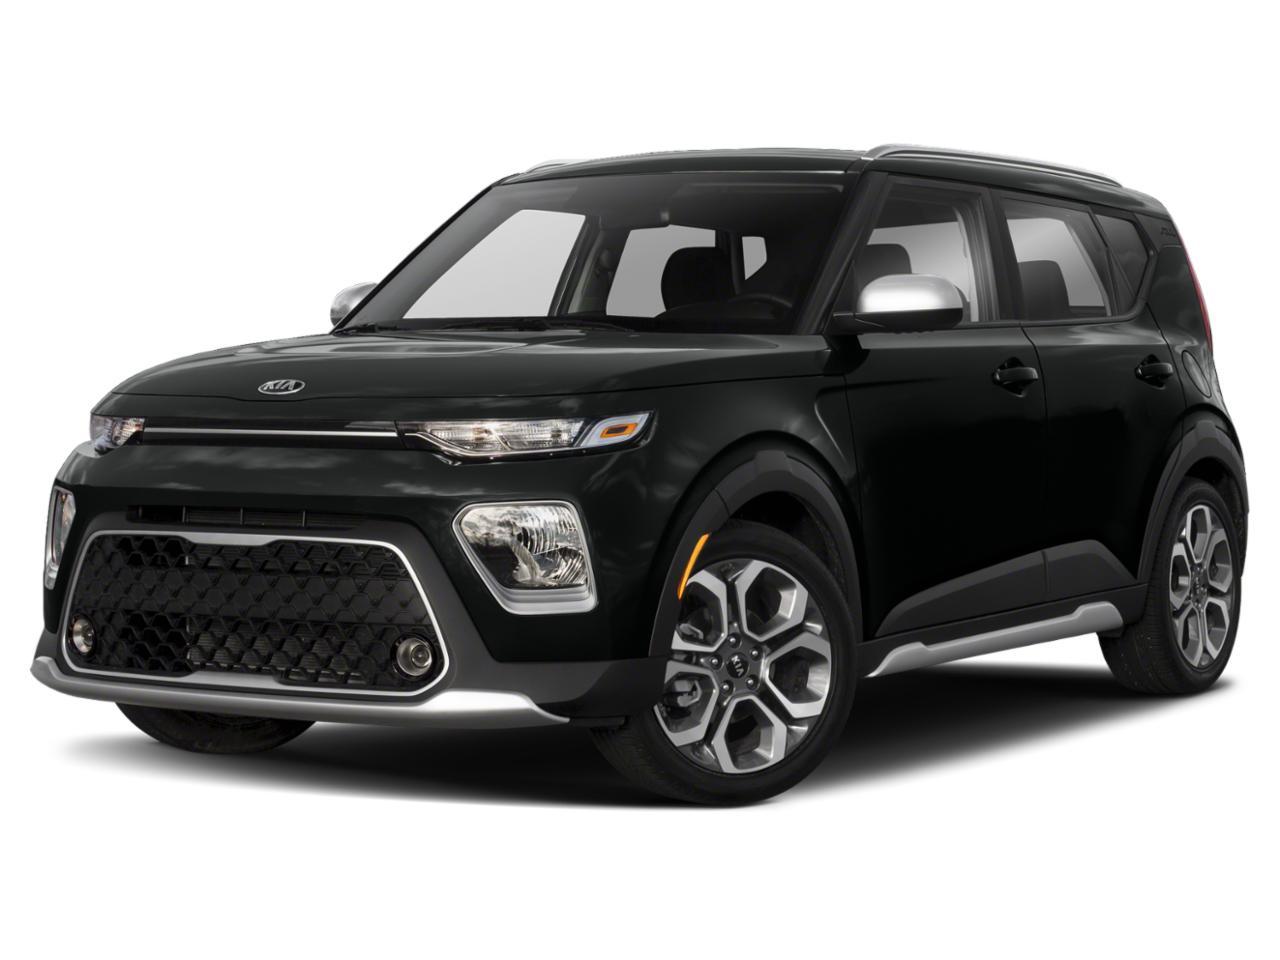 2020 Kia Soul Vehicle Photo in Cary, NC 27511